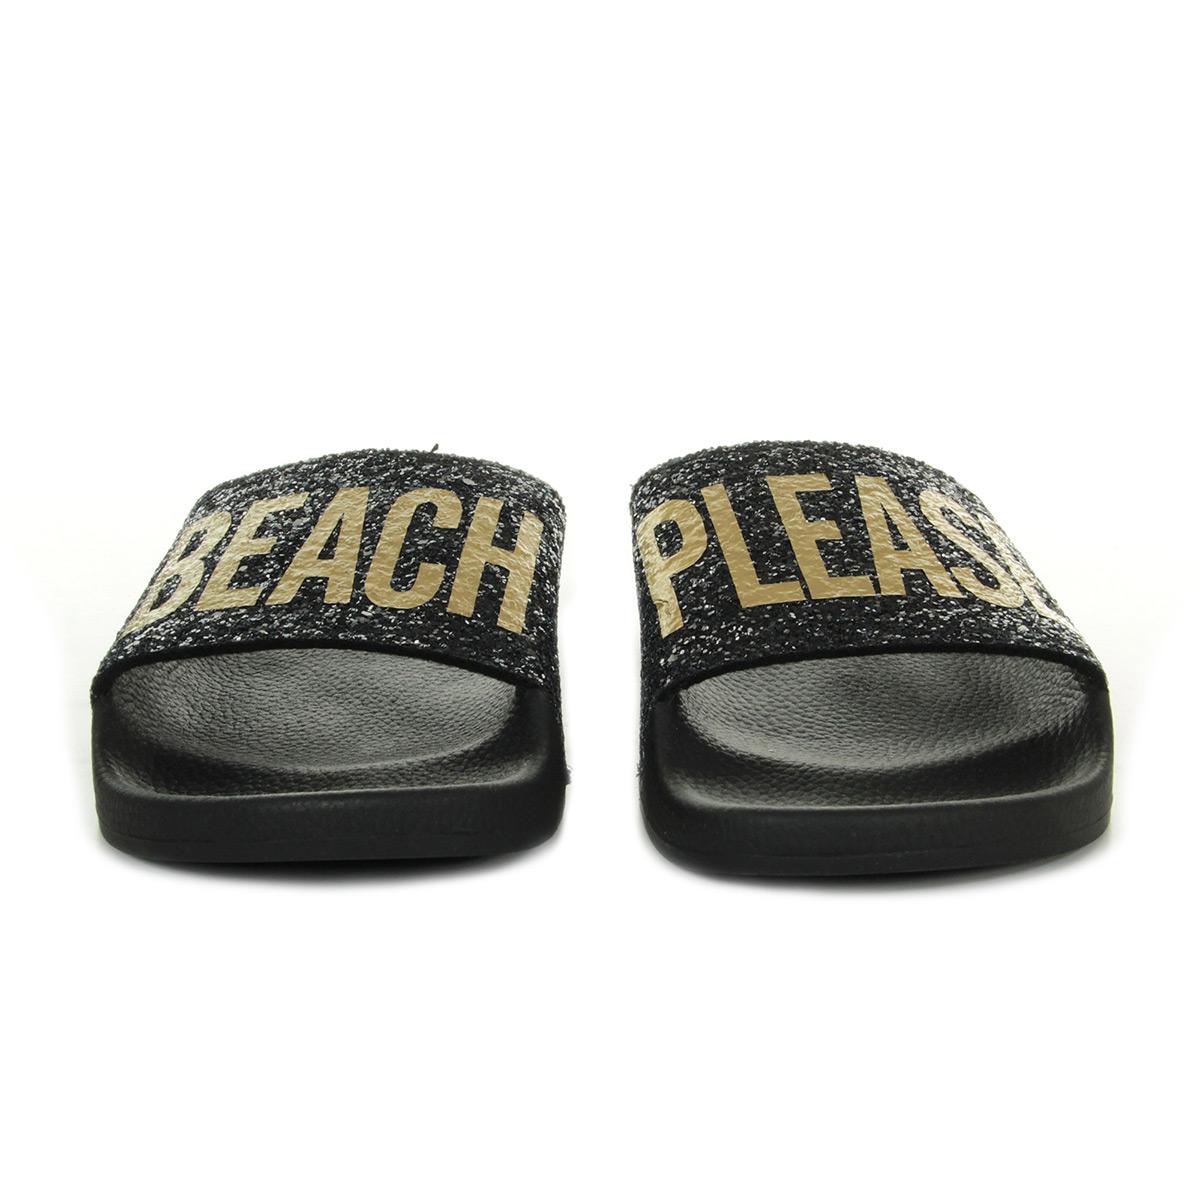 TheWhiteBrand Glitter Beach Please L0174, Sandales femme